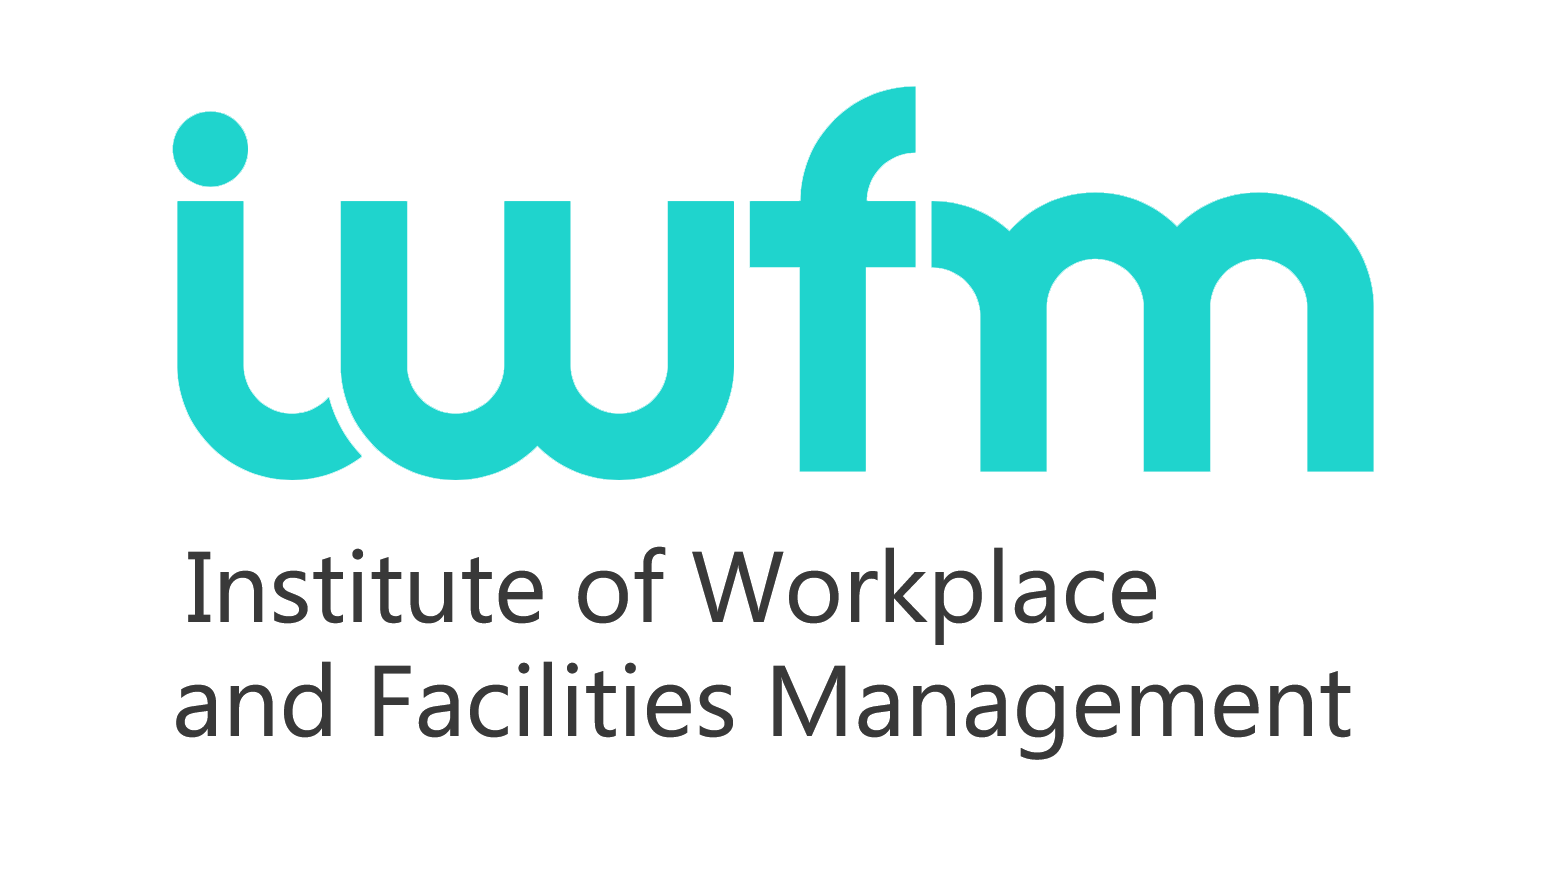 IWFM Courses